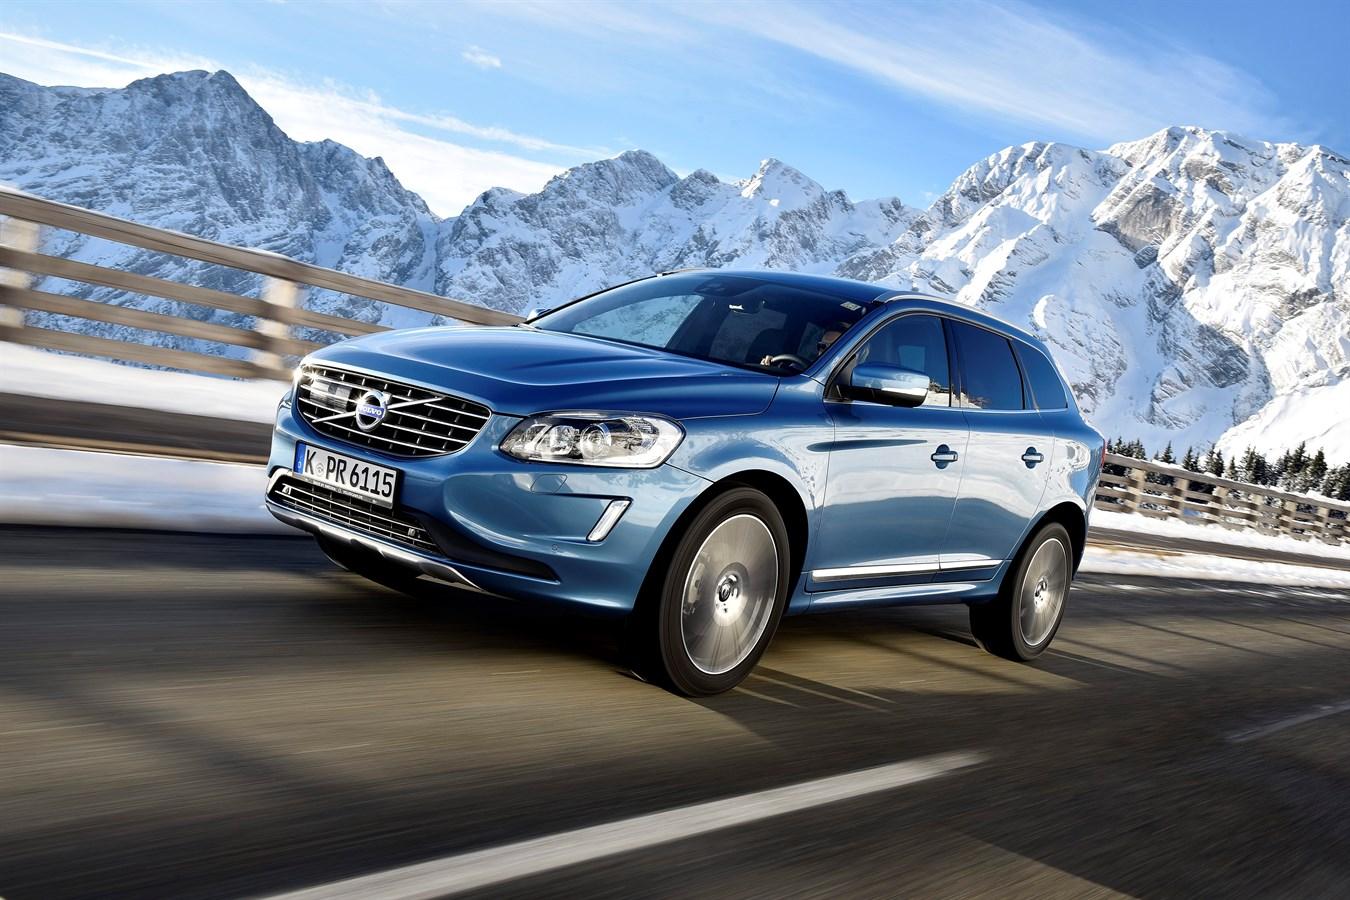 Volvo Xc60 Model Year 2017 Volvo Car Group Global Media Newsroom